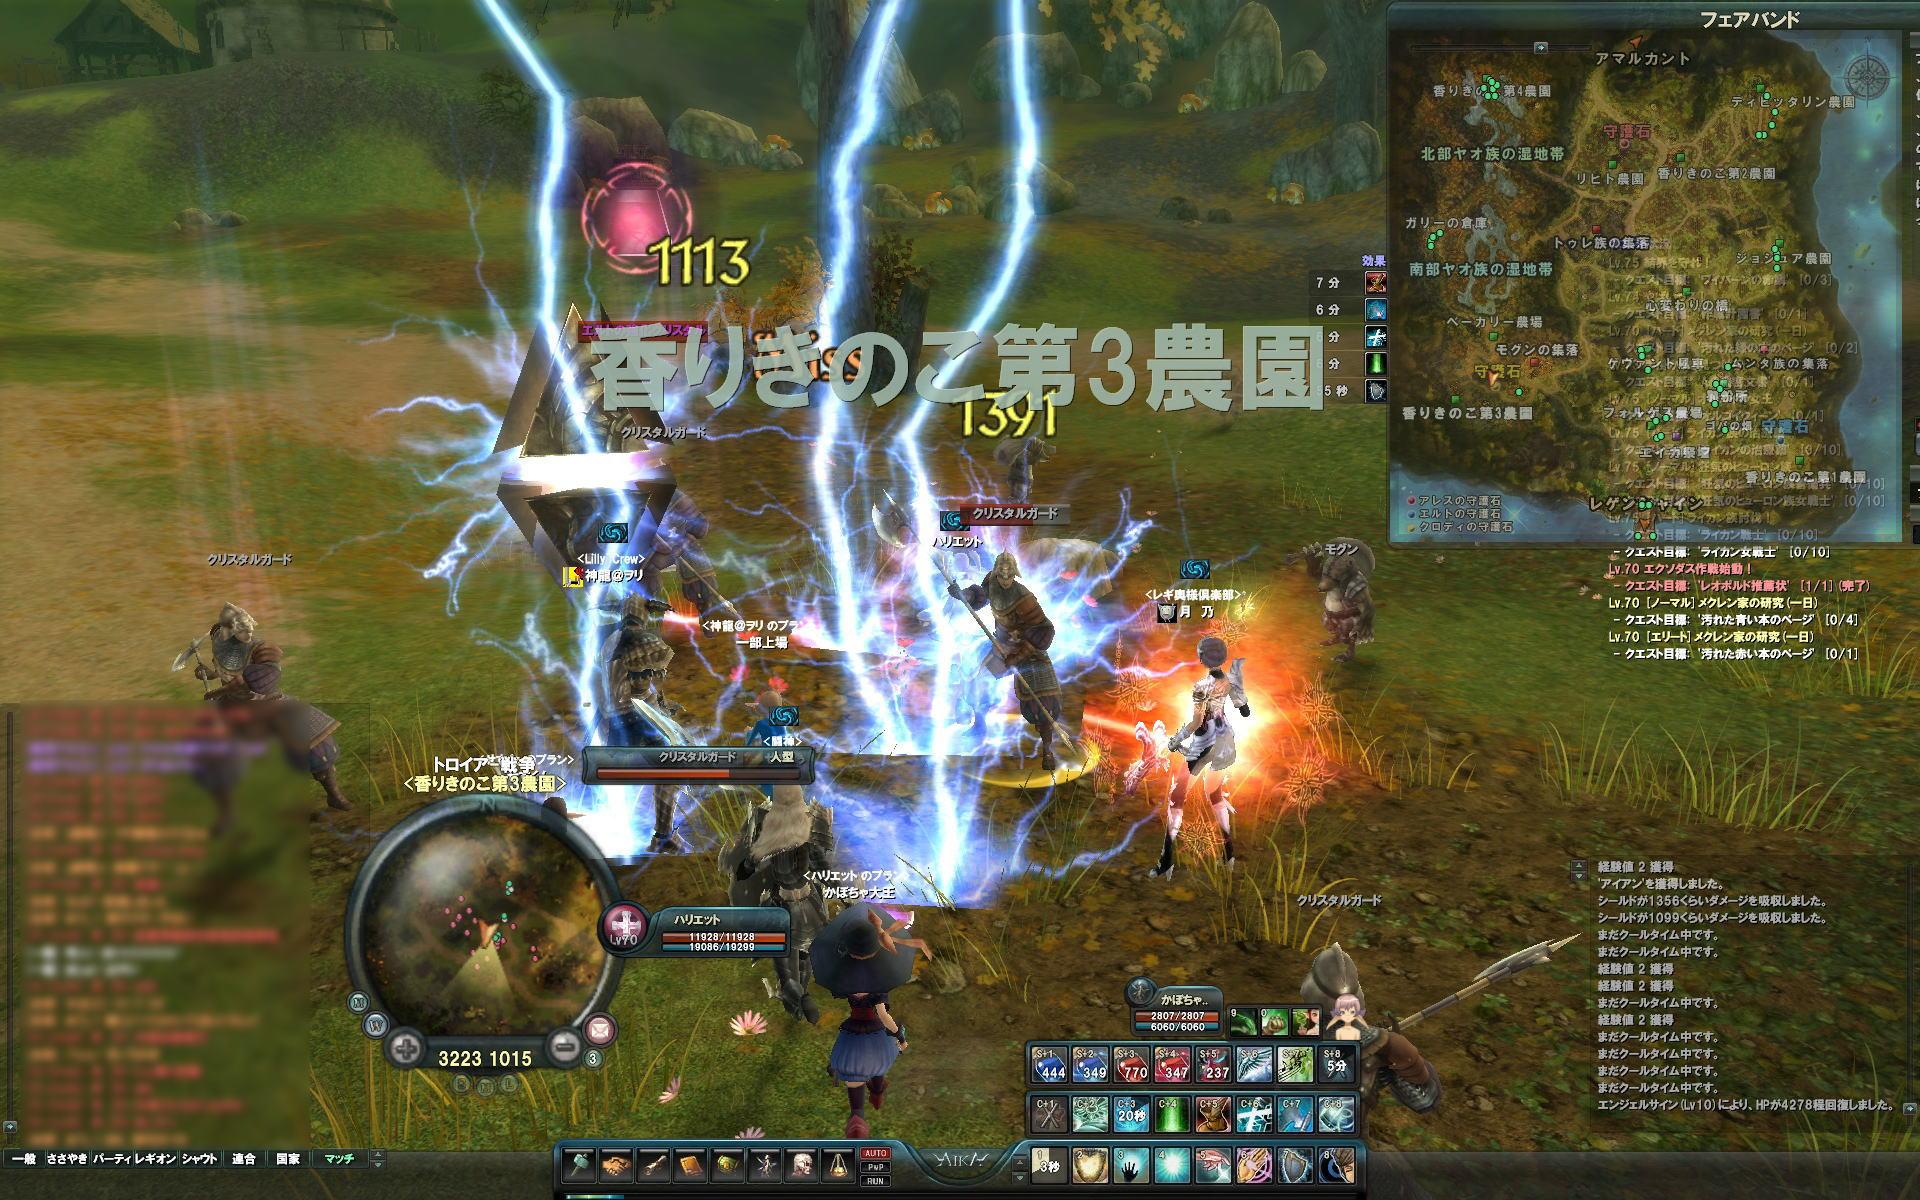 pcss20101213_001.jpg